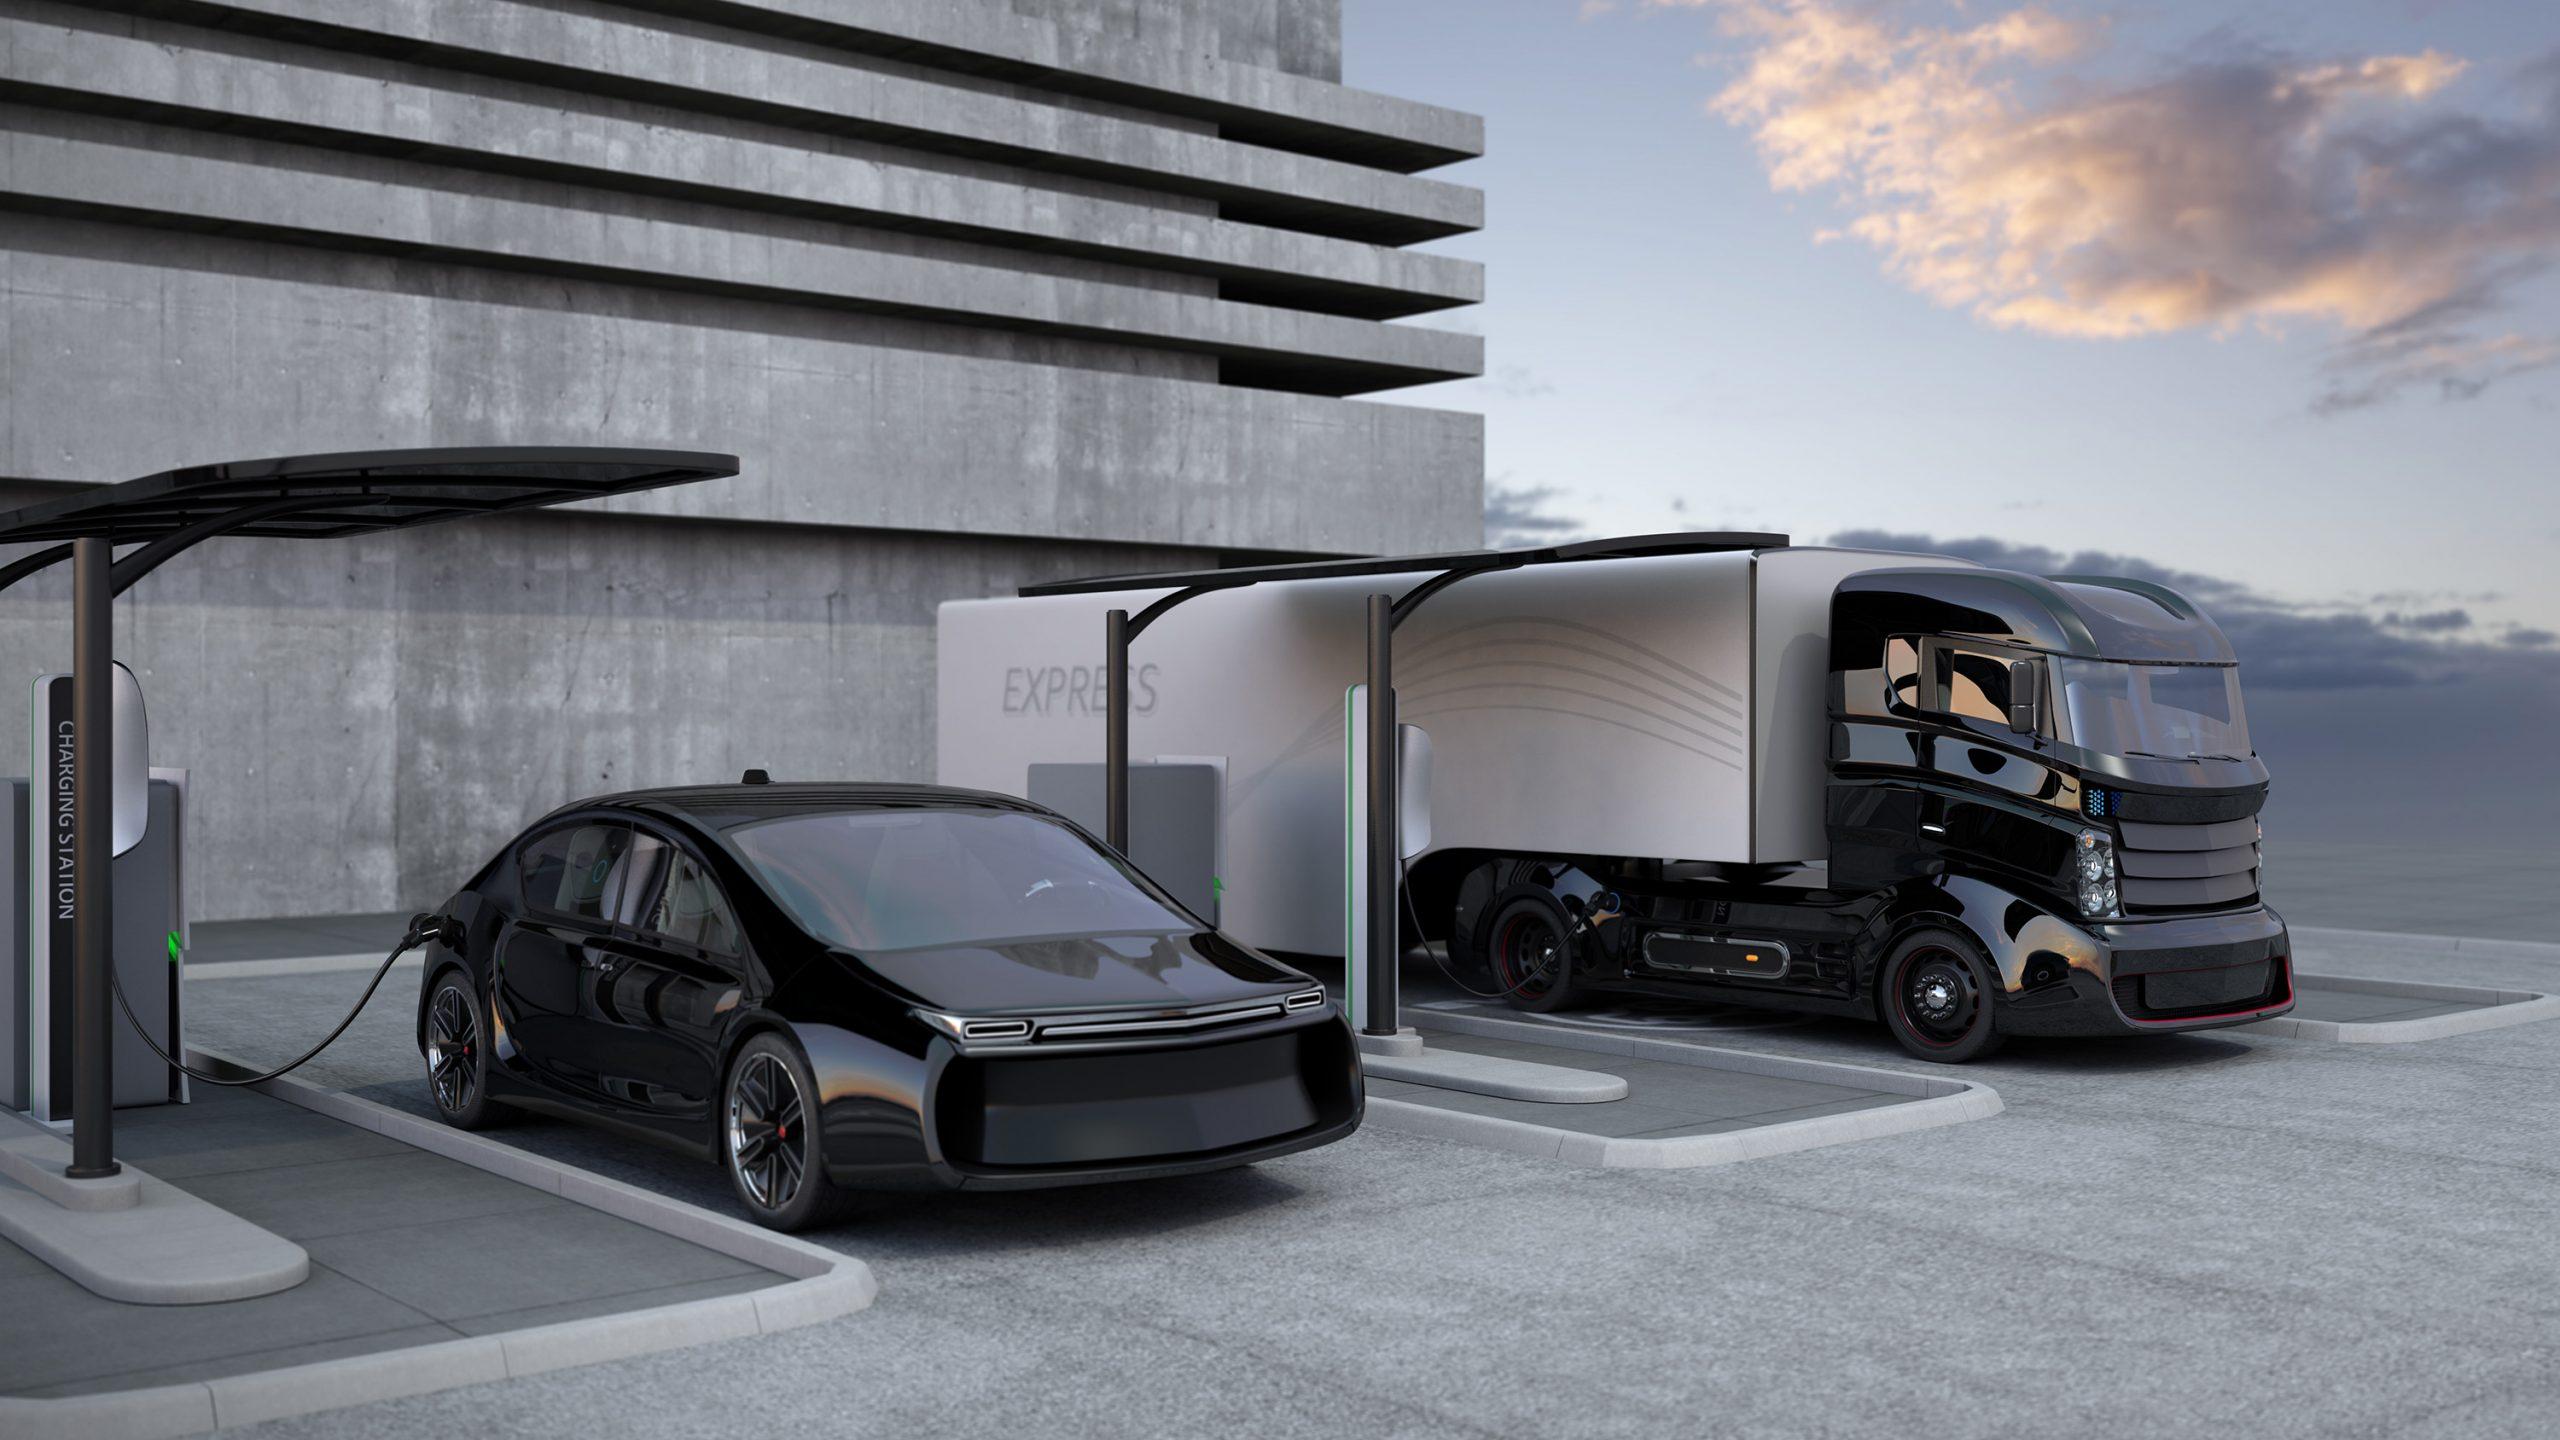 EVトラック普及で送電網は耐えられるか?